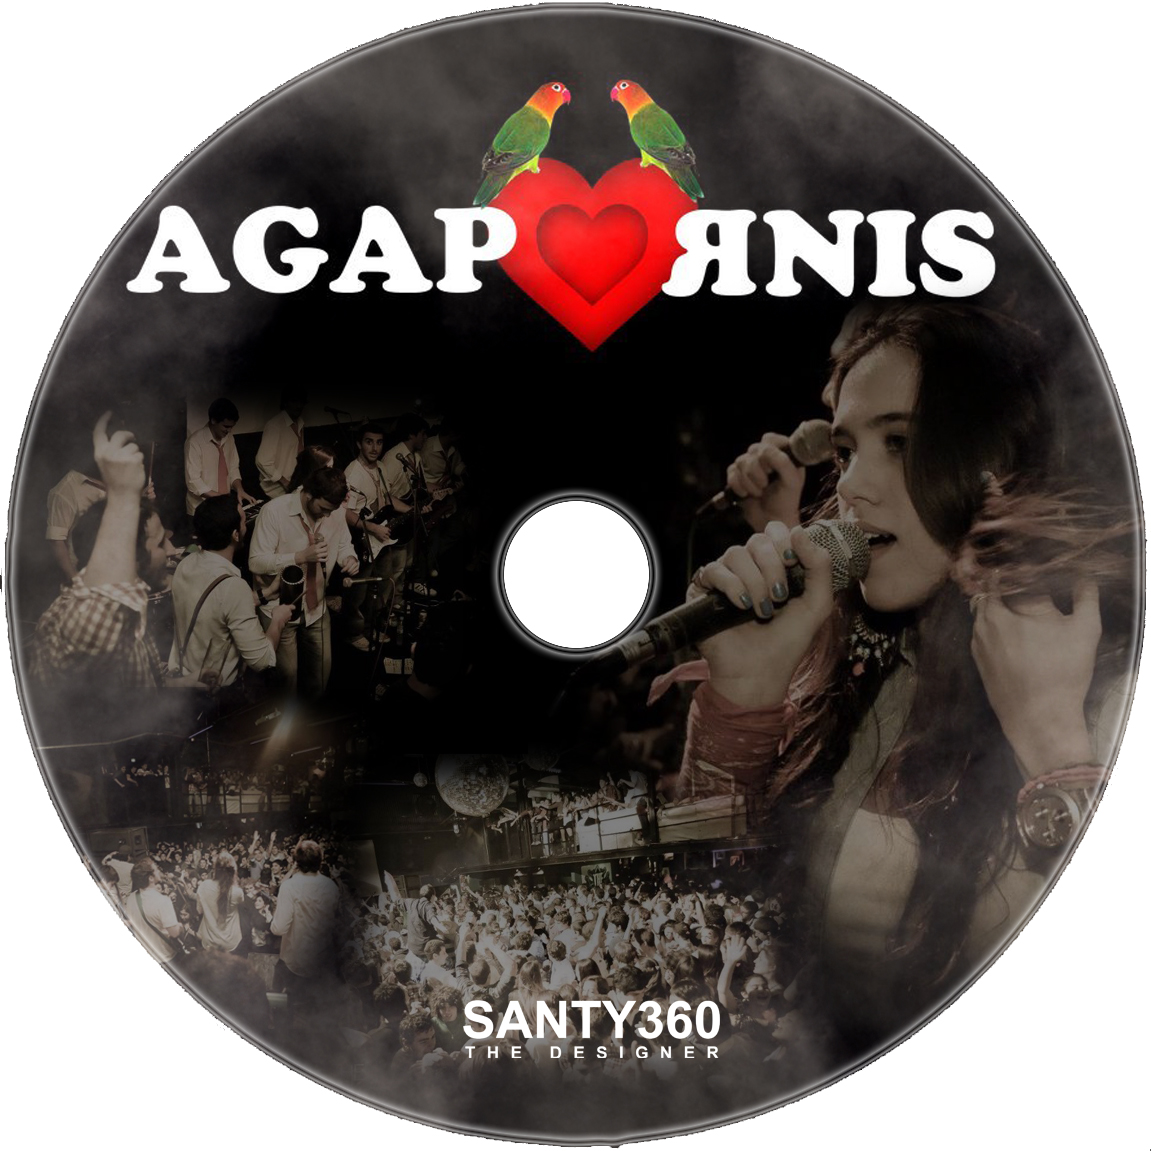 http://2.bp.blogspot.com/-6wndzpxx4aY/UGNCW7hu7pI/AAAAAAAAAKo/DtXrR4j7vtM/s1600/Agapornis+-+Disco+(SANTY360).jpg